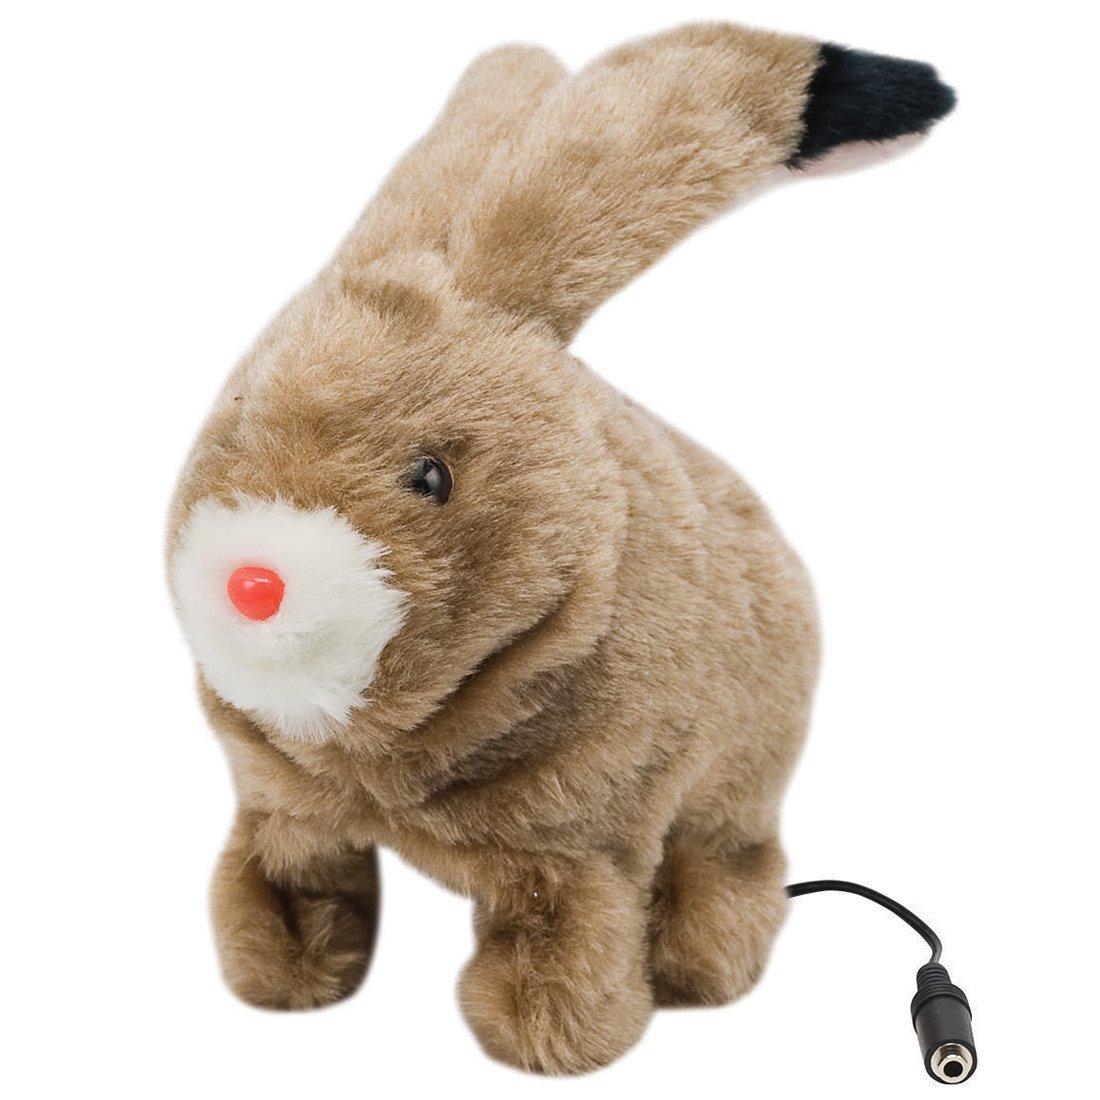 Robbie Rabbit - by Ablenet # 30050311